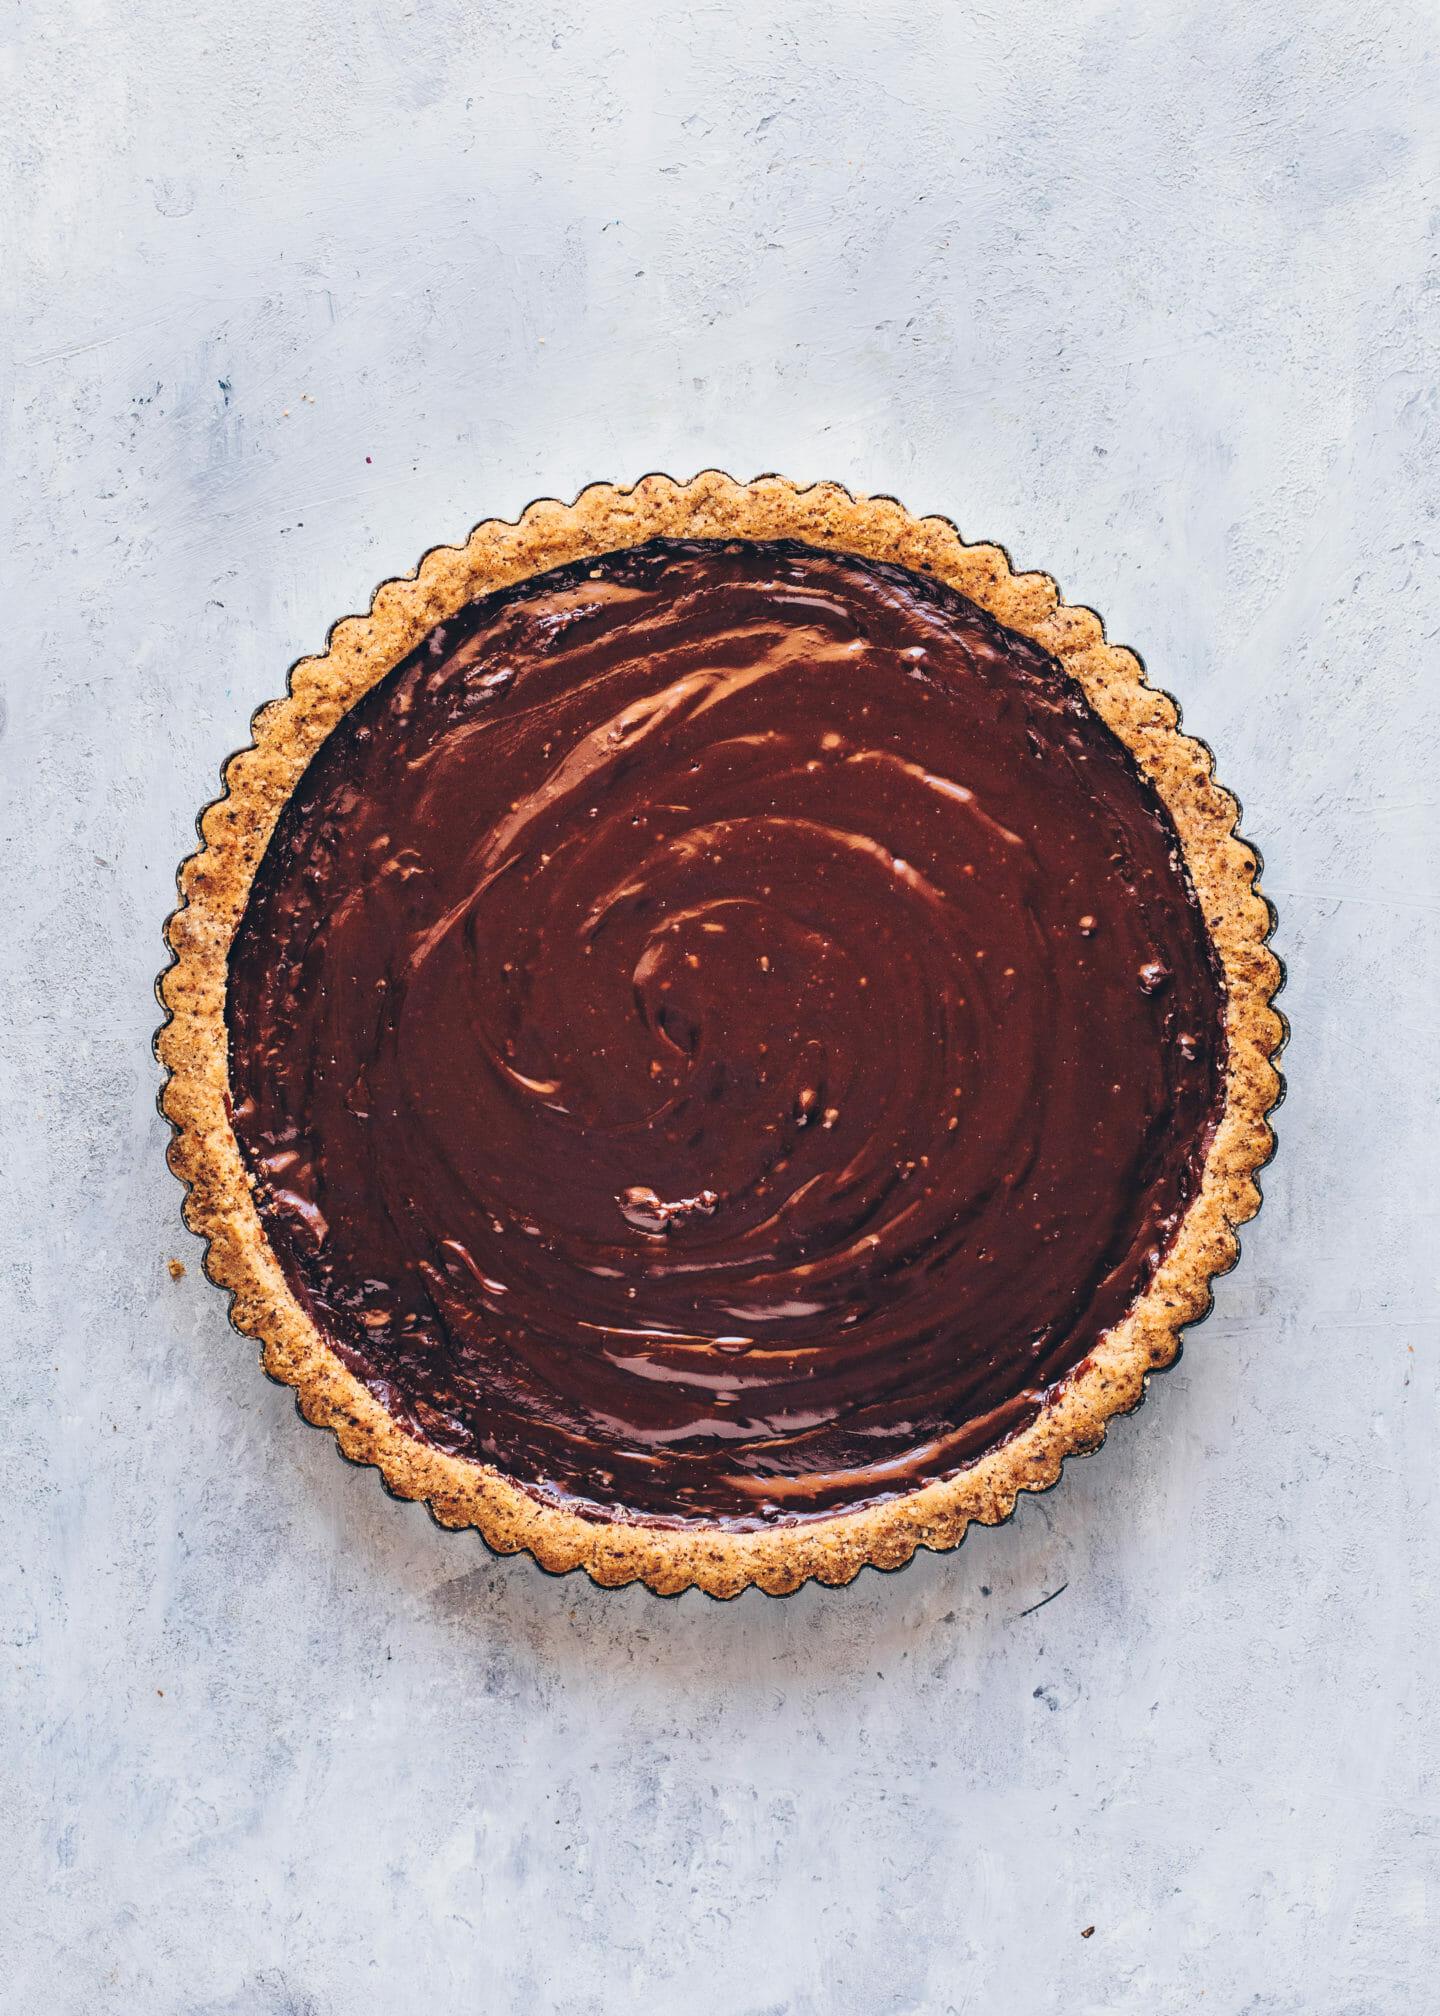 Haselnuss Nutella-Tarte mit Schokoladen-Ganache